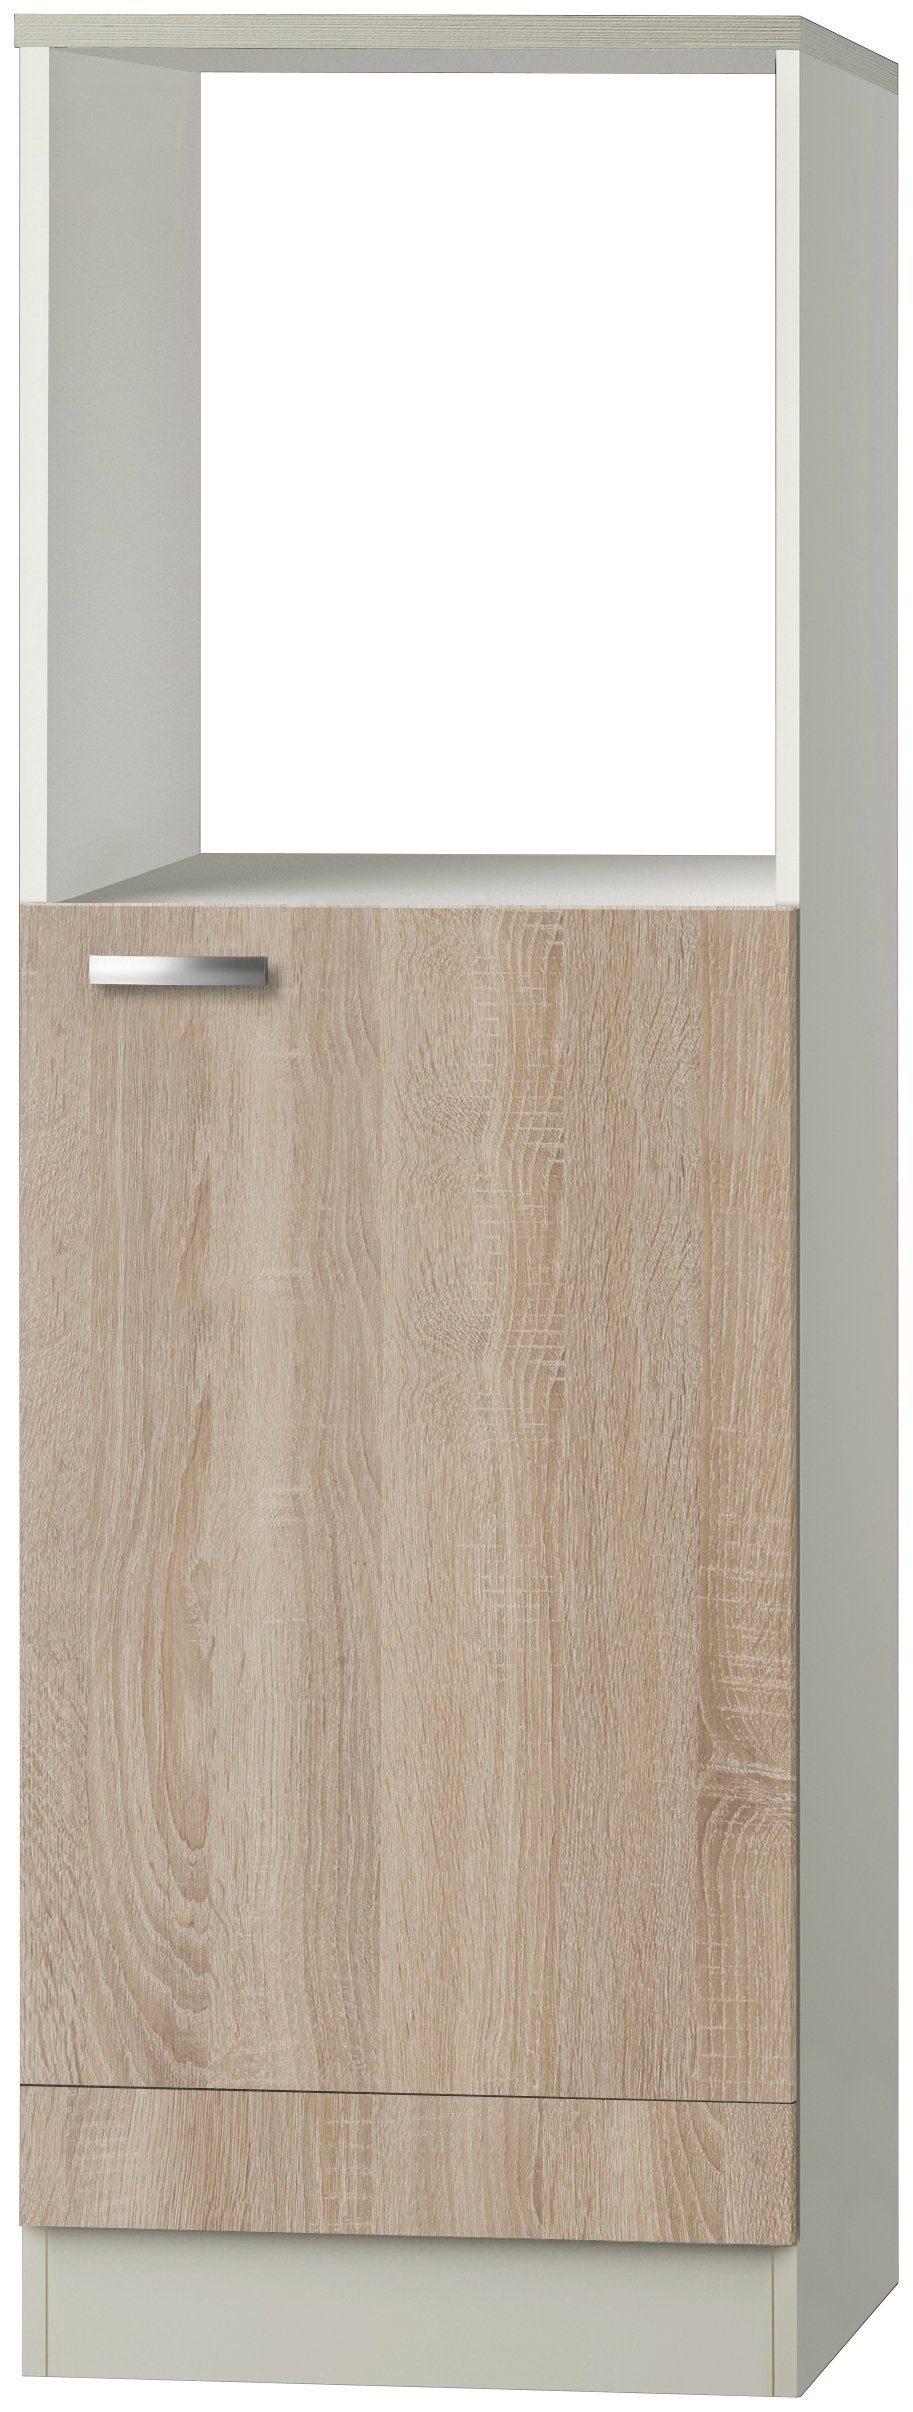 Kombinierter Backofen-Kühlumbauschrank »Padua, Höhe 174,4 cm«